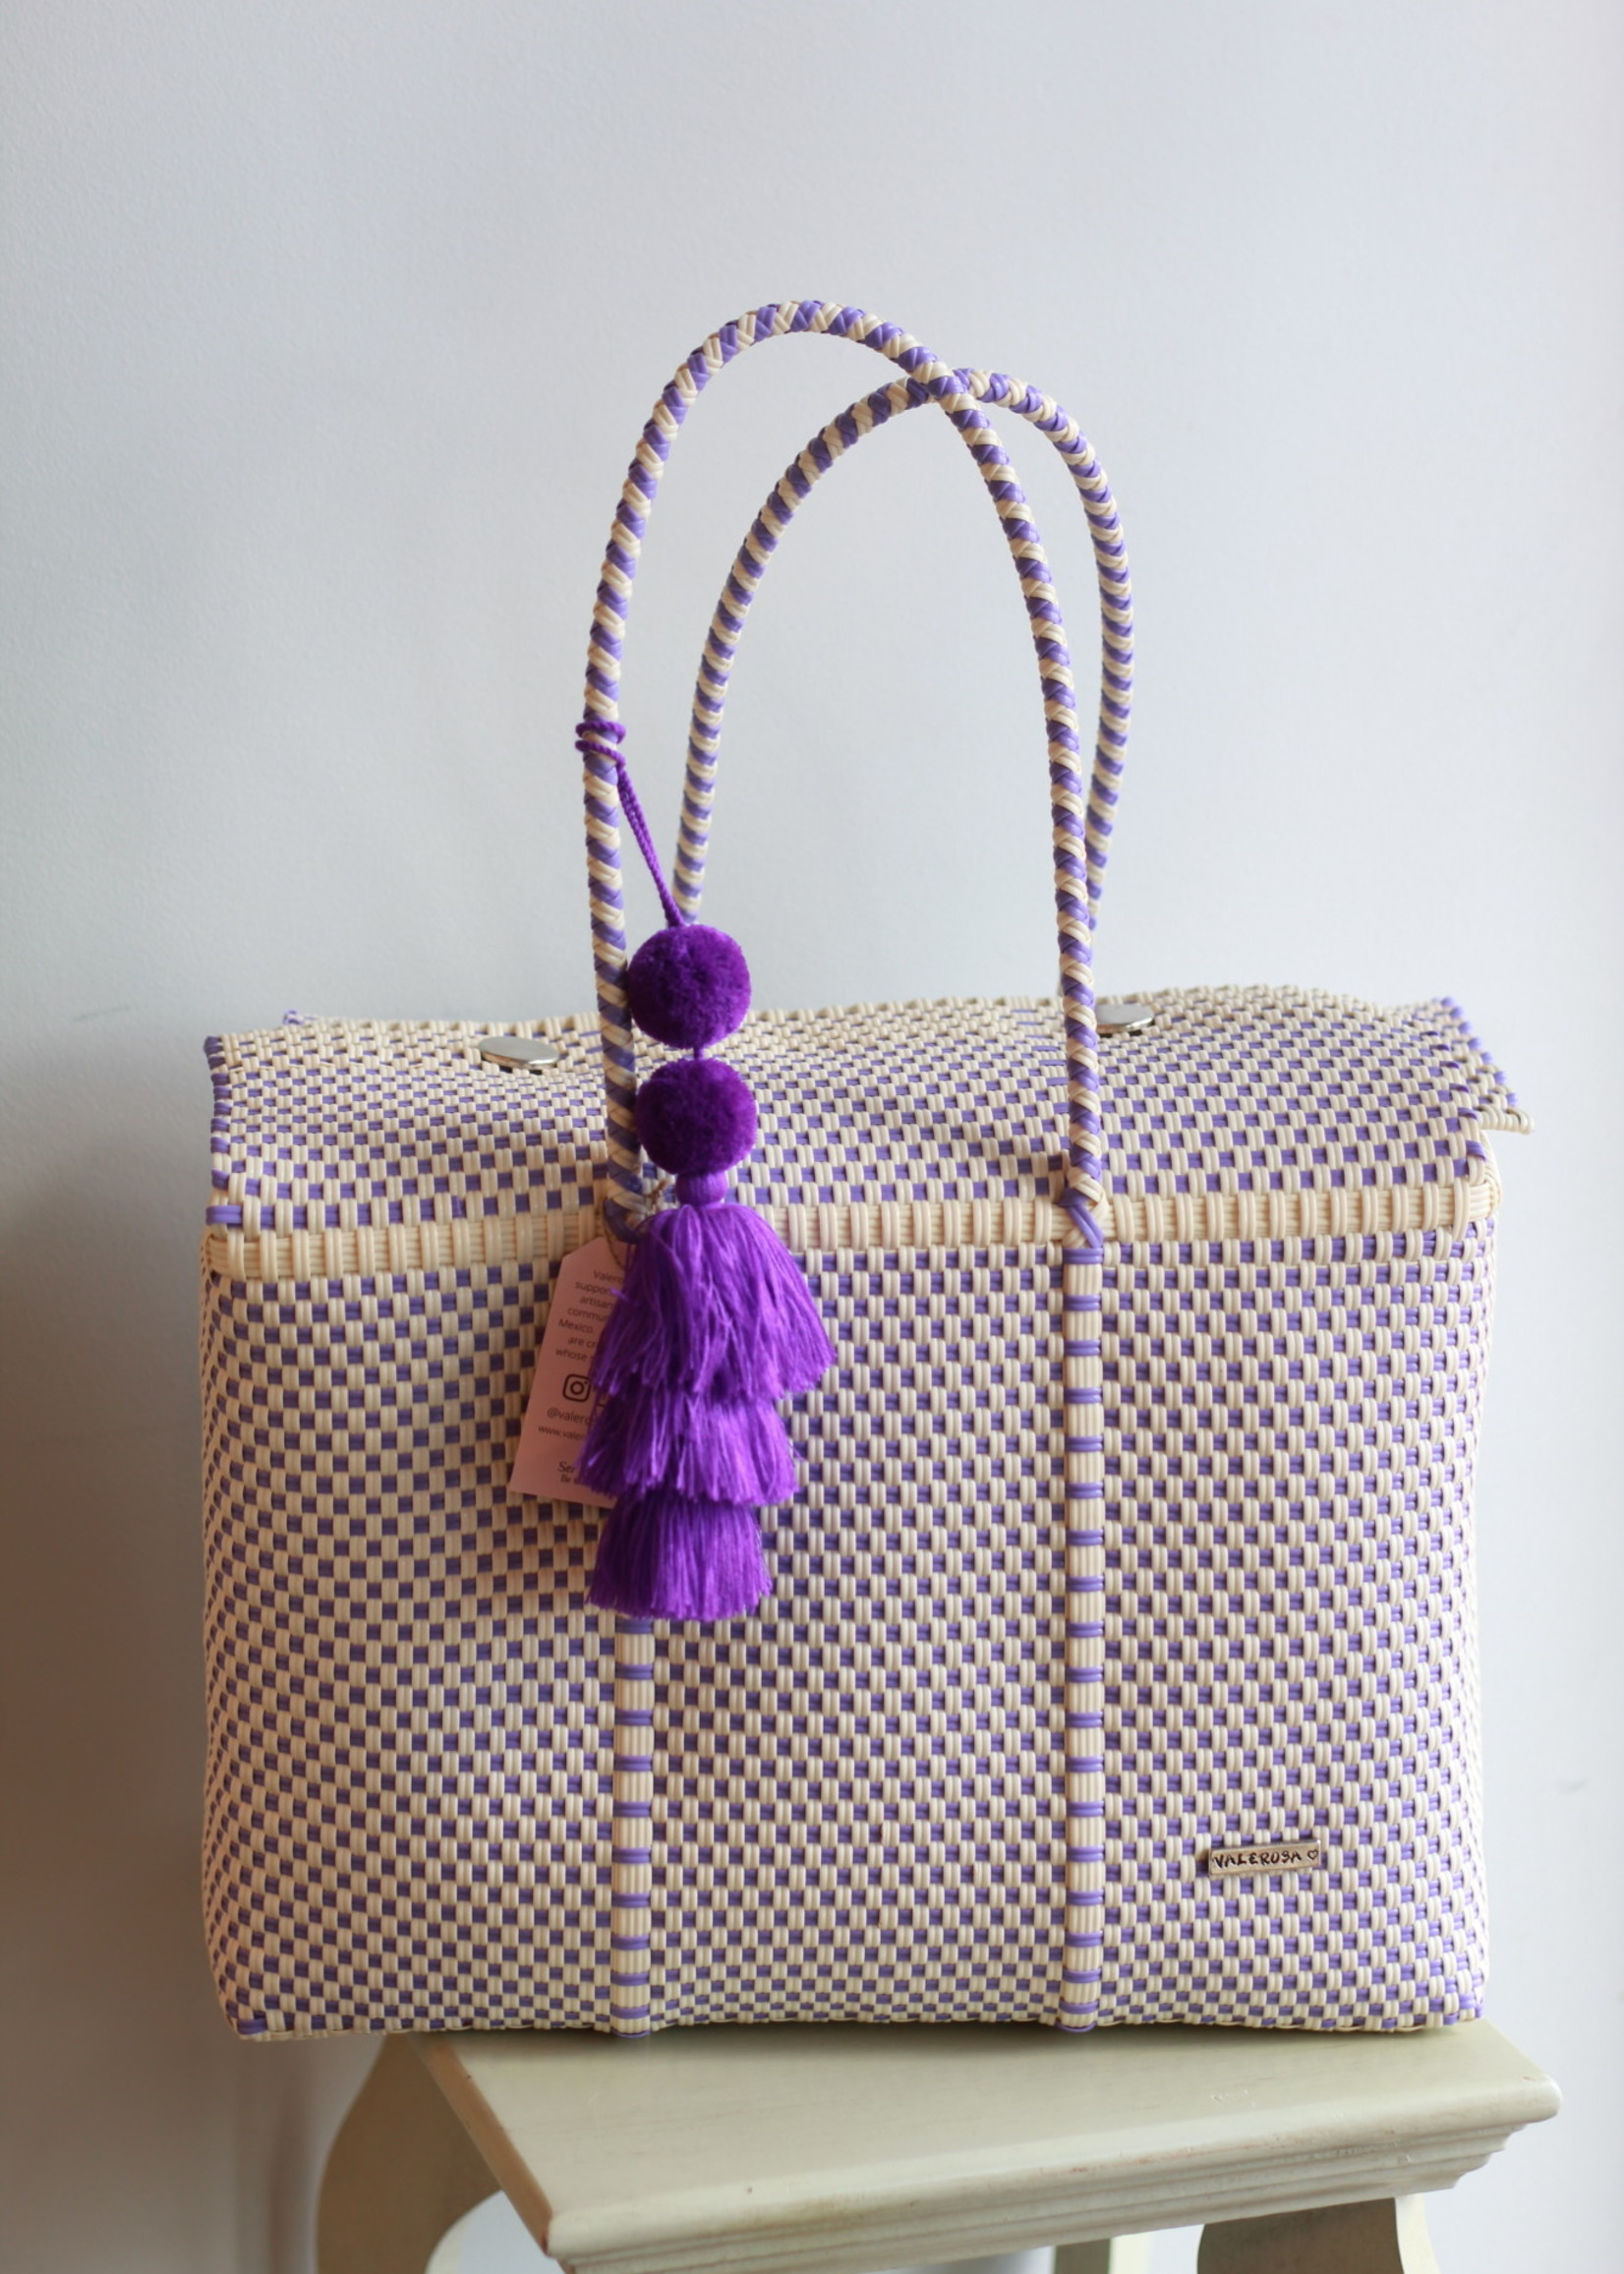 Valerosa Boutique Shades of Lavender Dia Duffle Bag With Purple Tassle